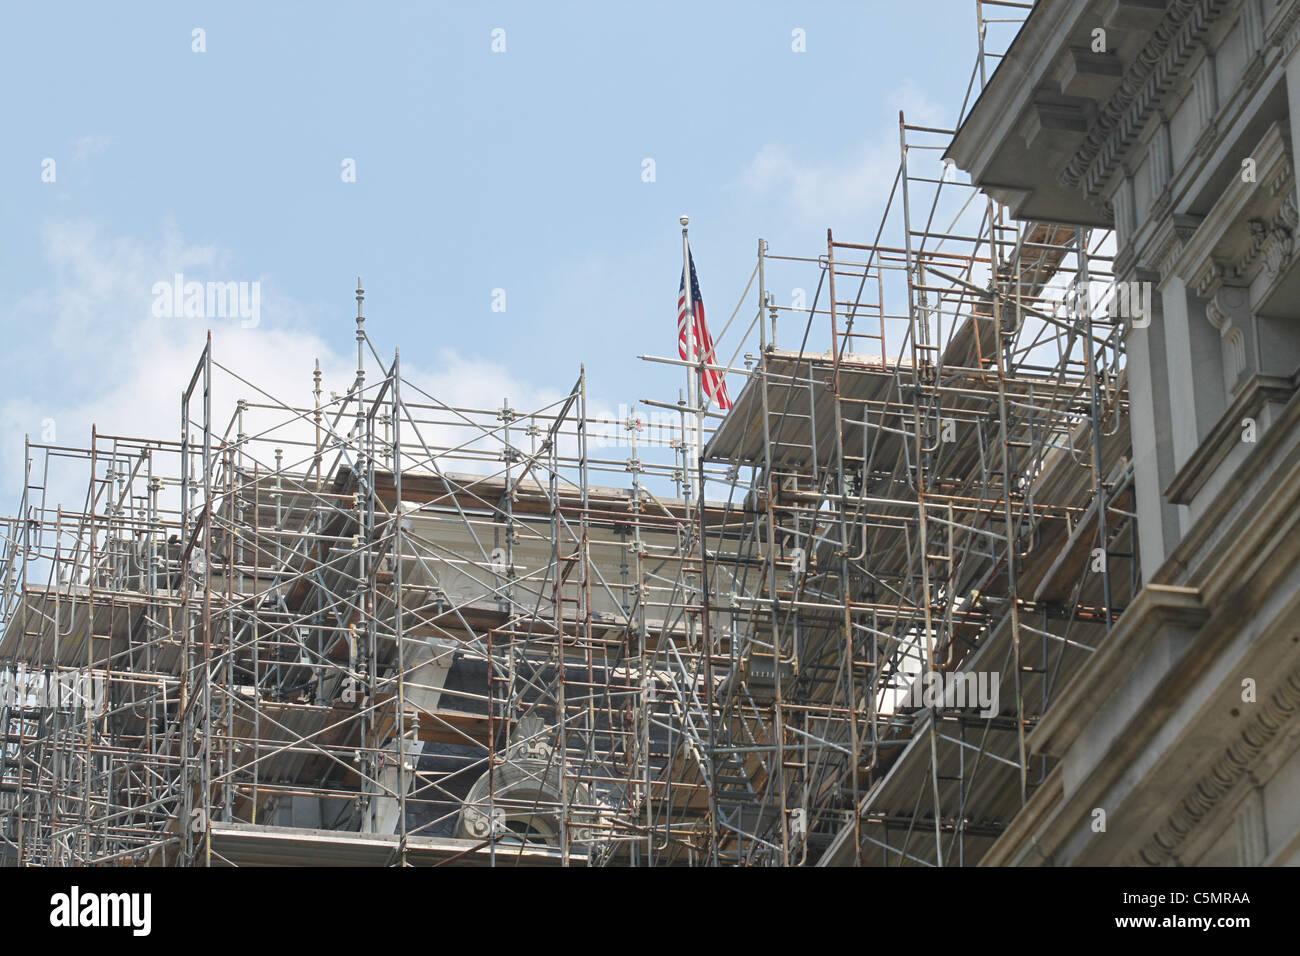 Scaffolding at renovation site Stock Photo